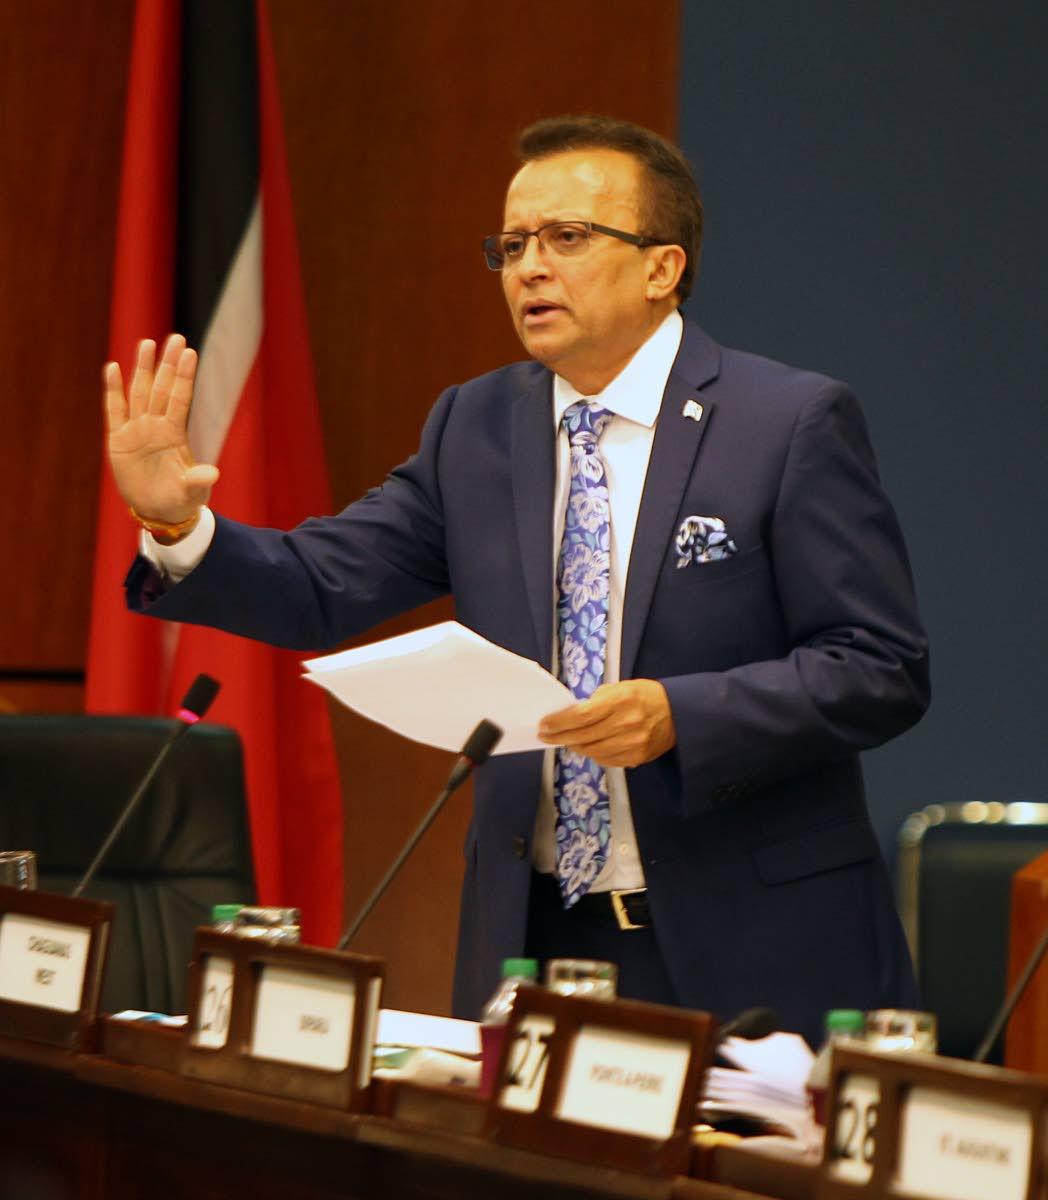 Opposition MP Ganga Singh